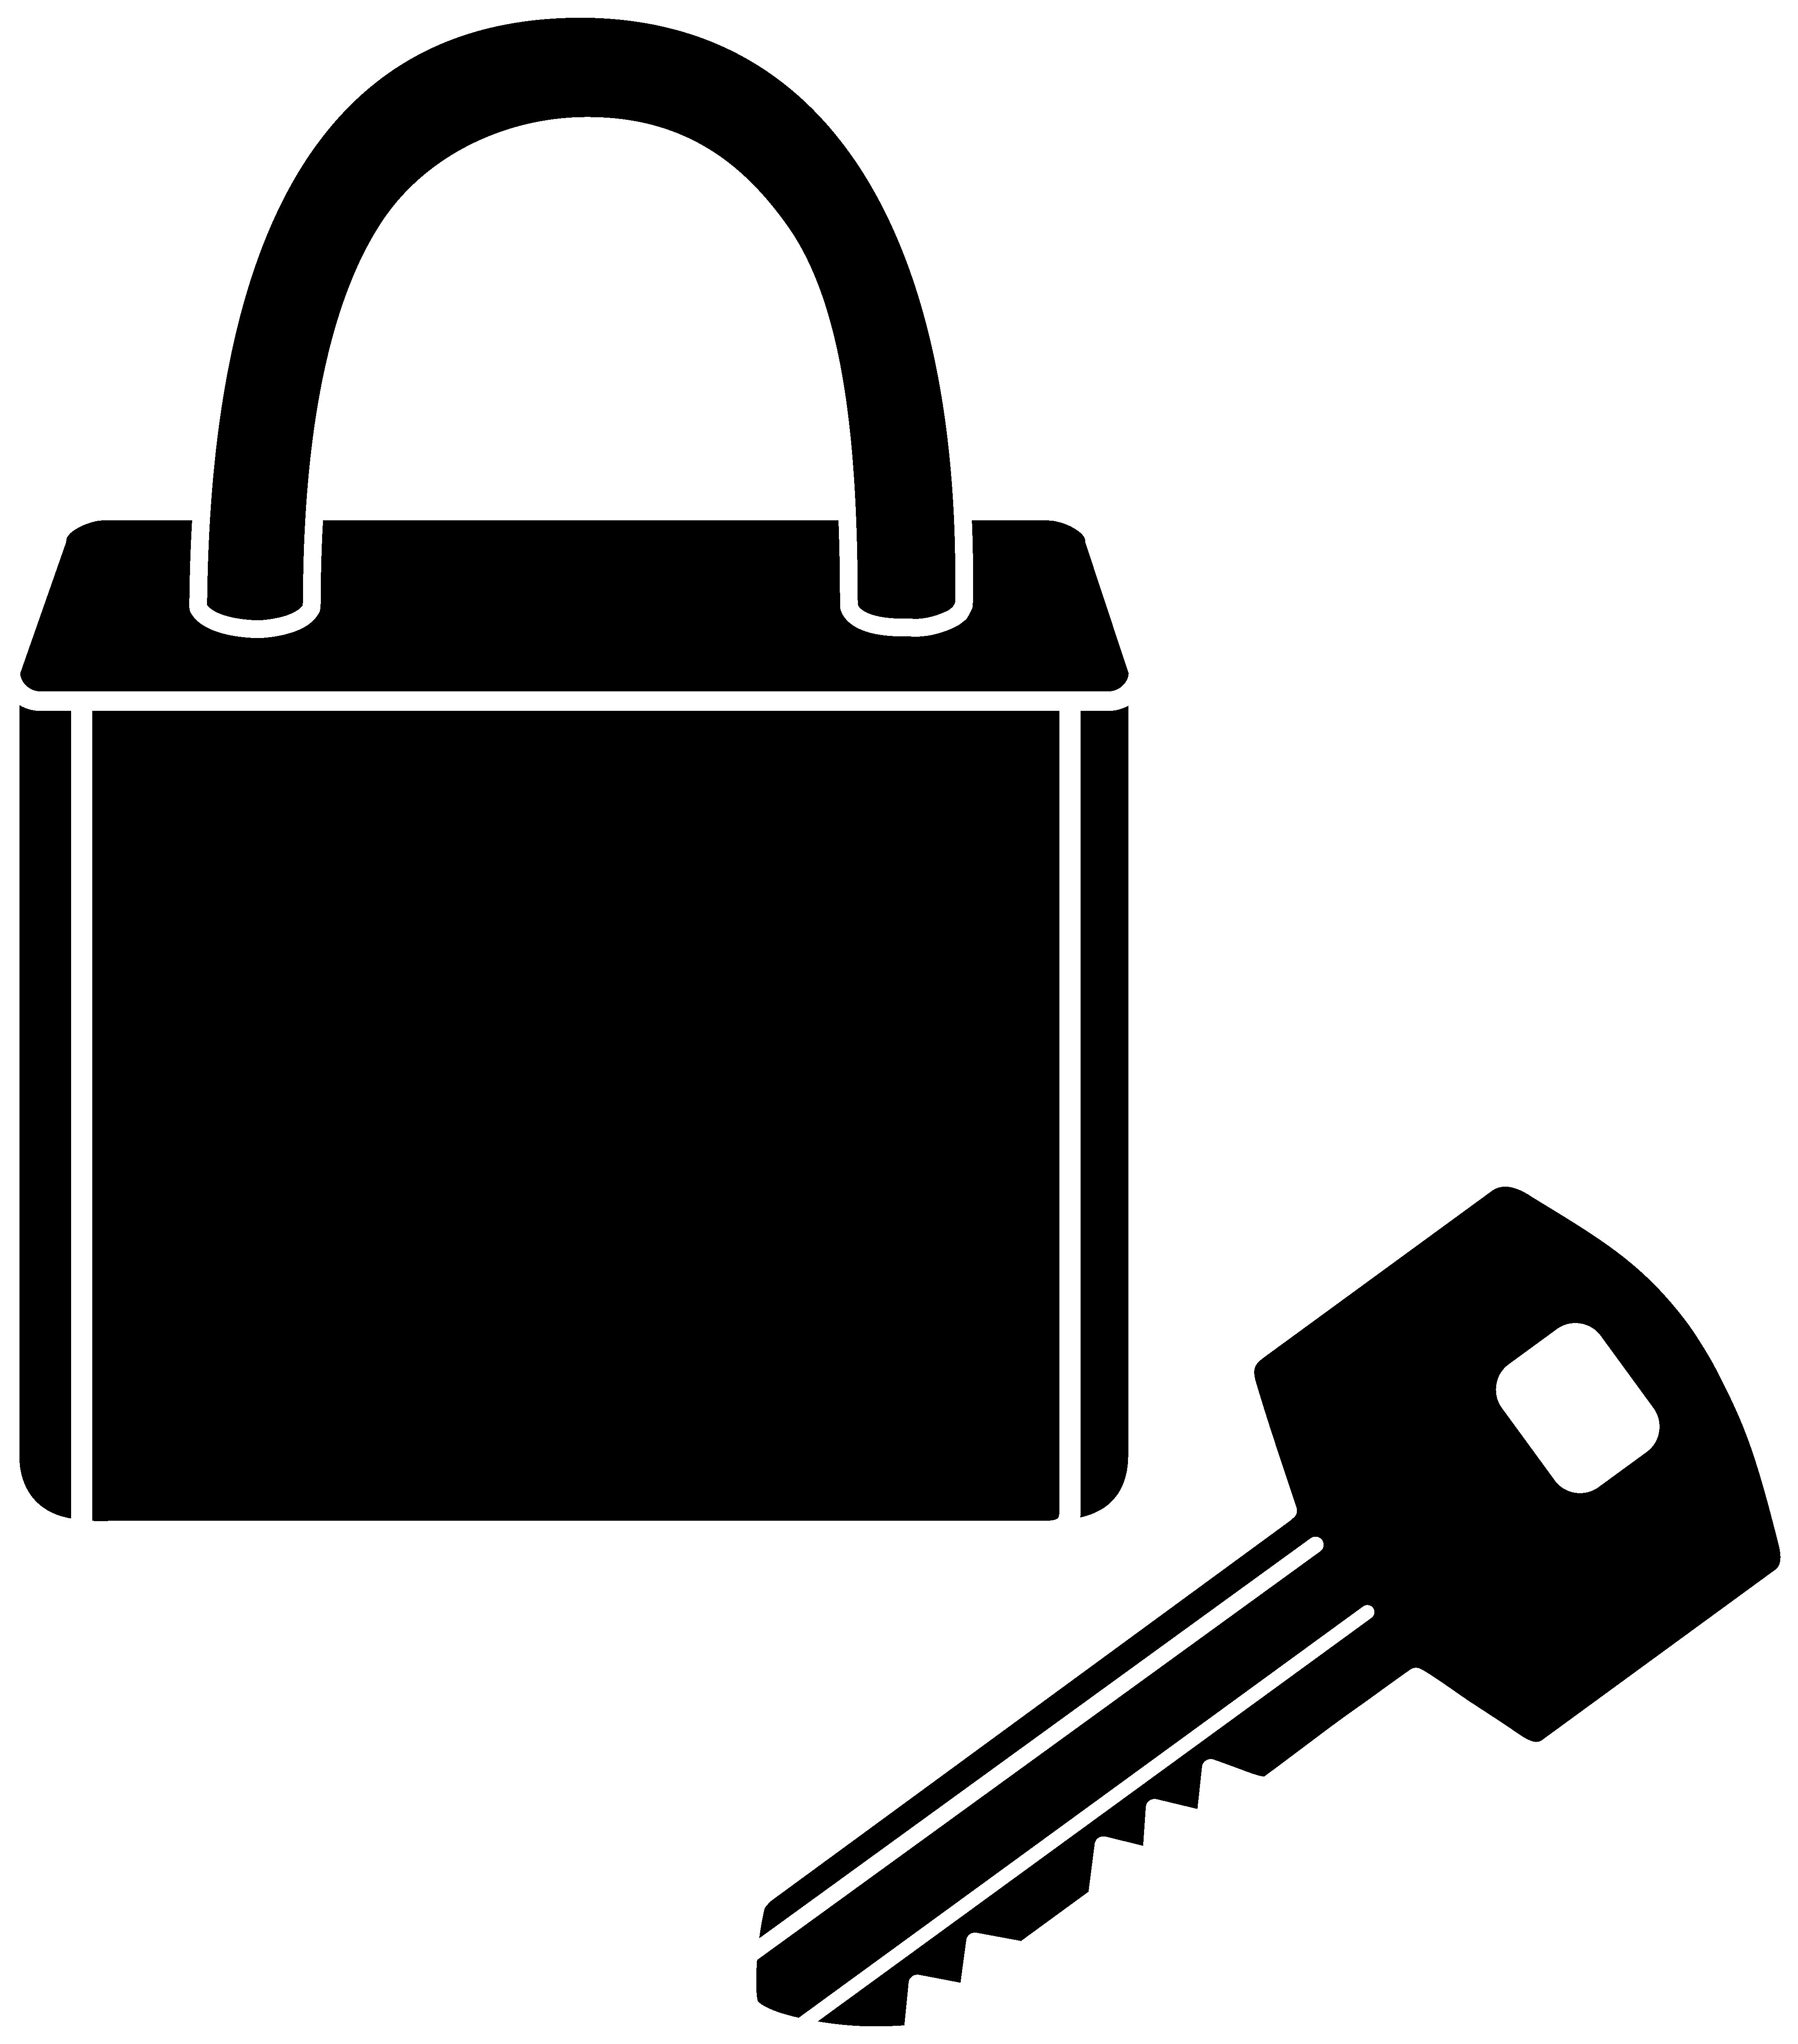 PNG Keys And Locks - 50441